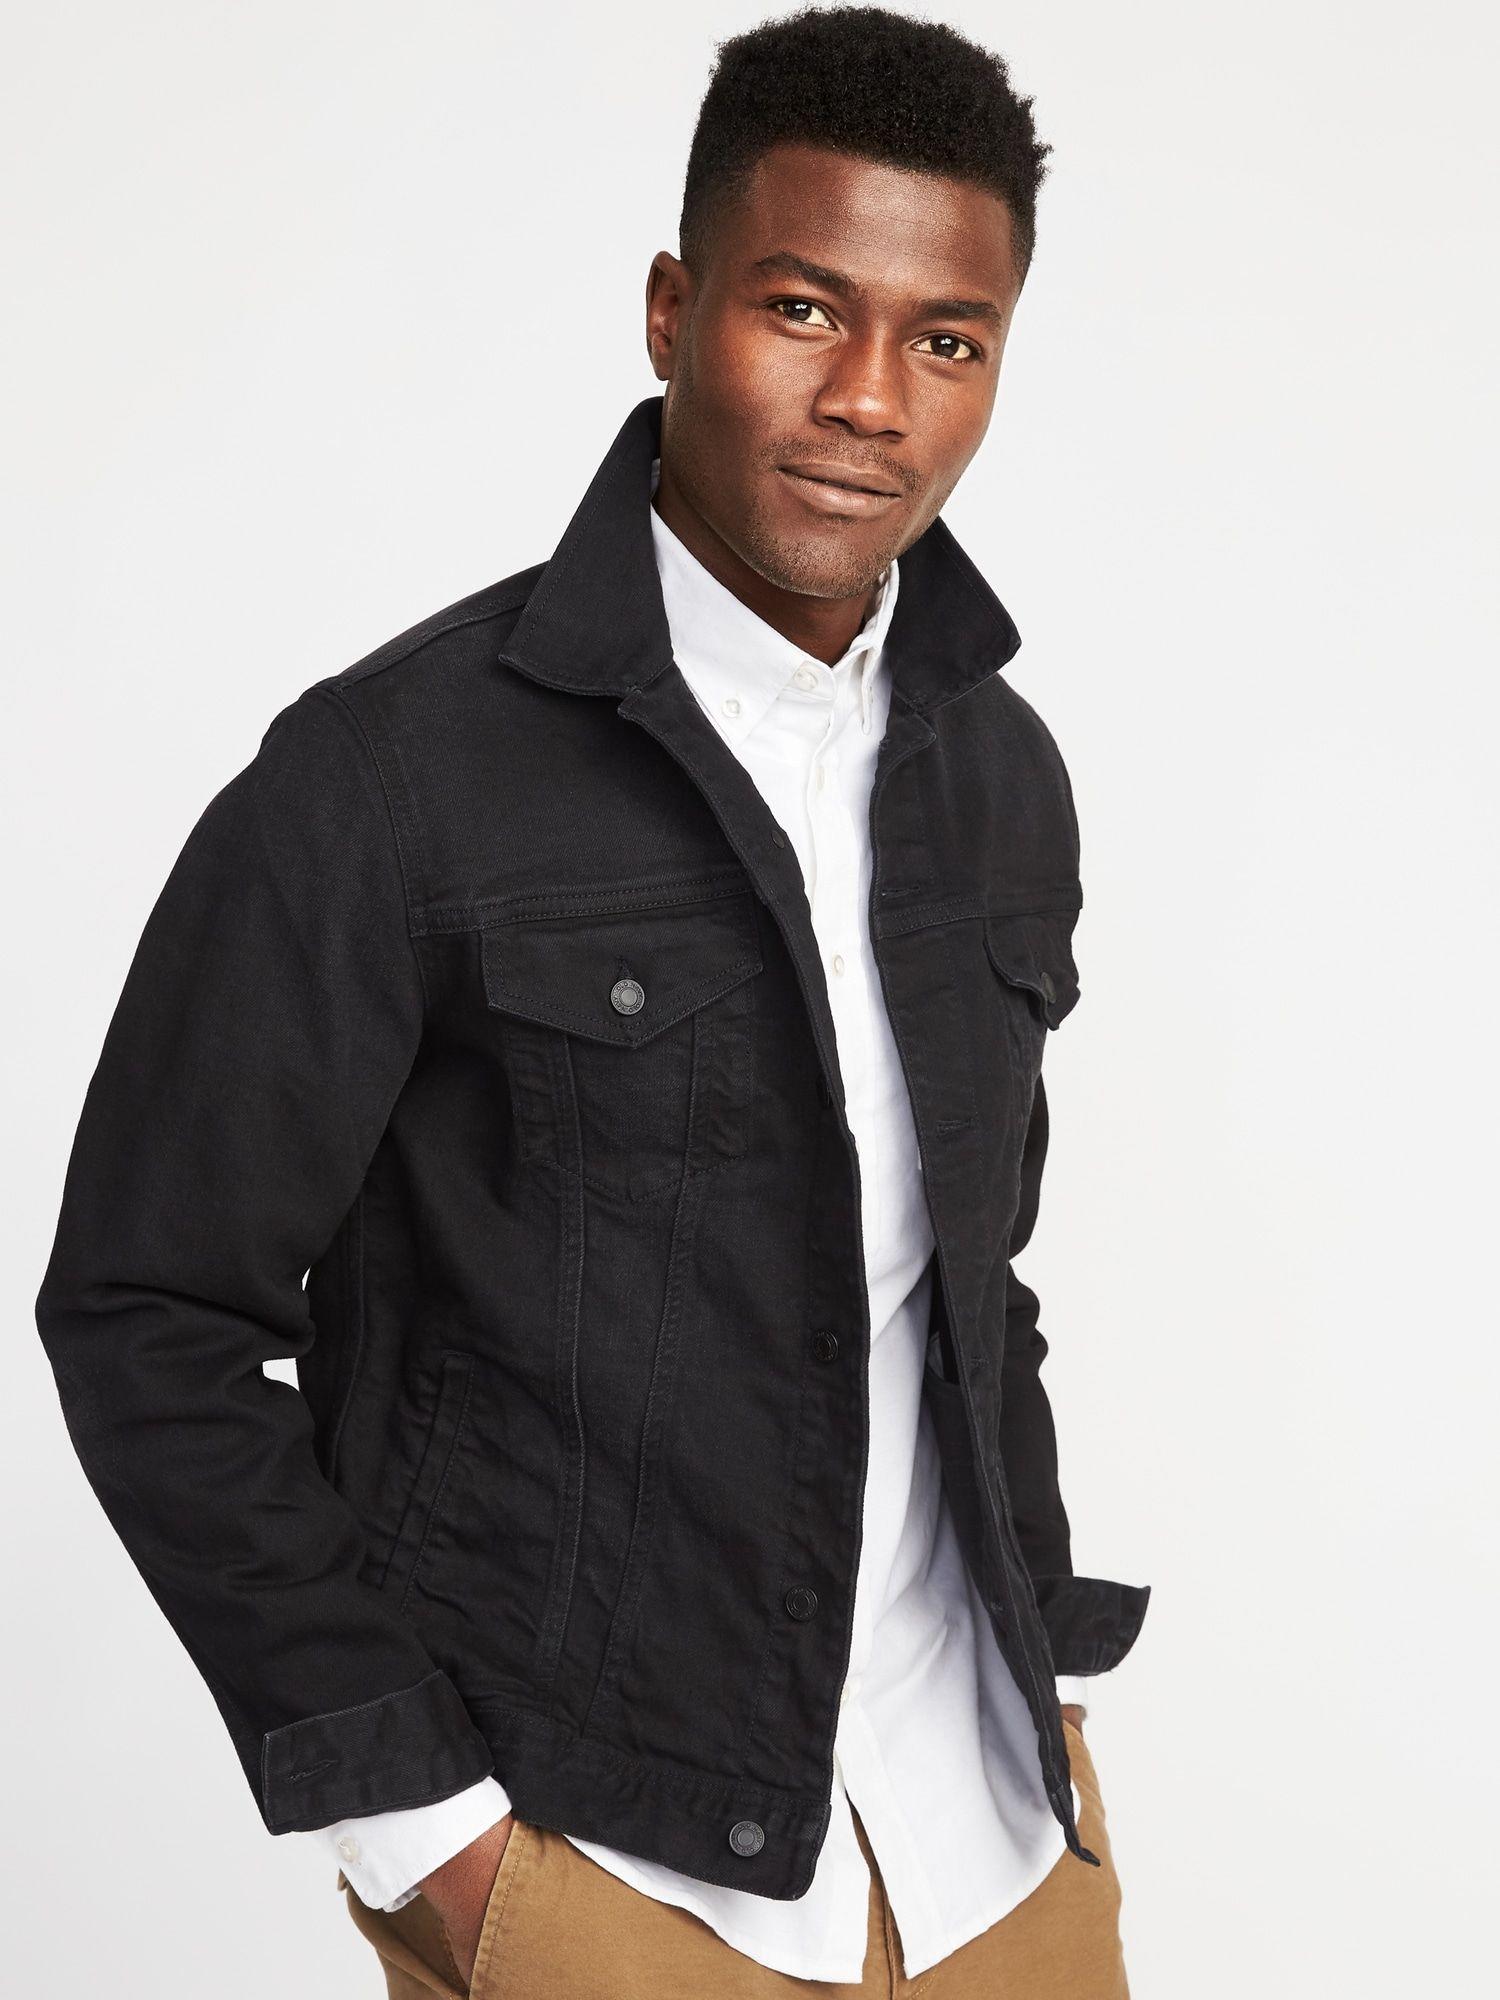 product photo Denim jacket men, Black denim jacket men